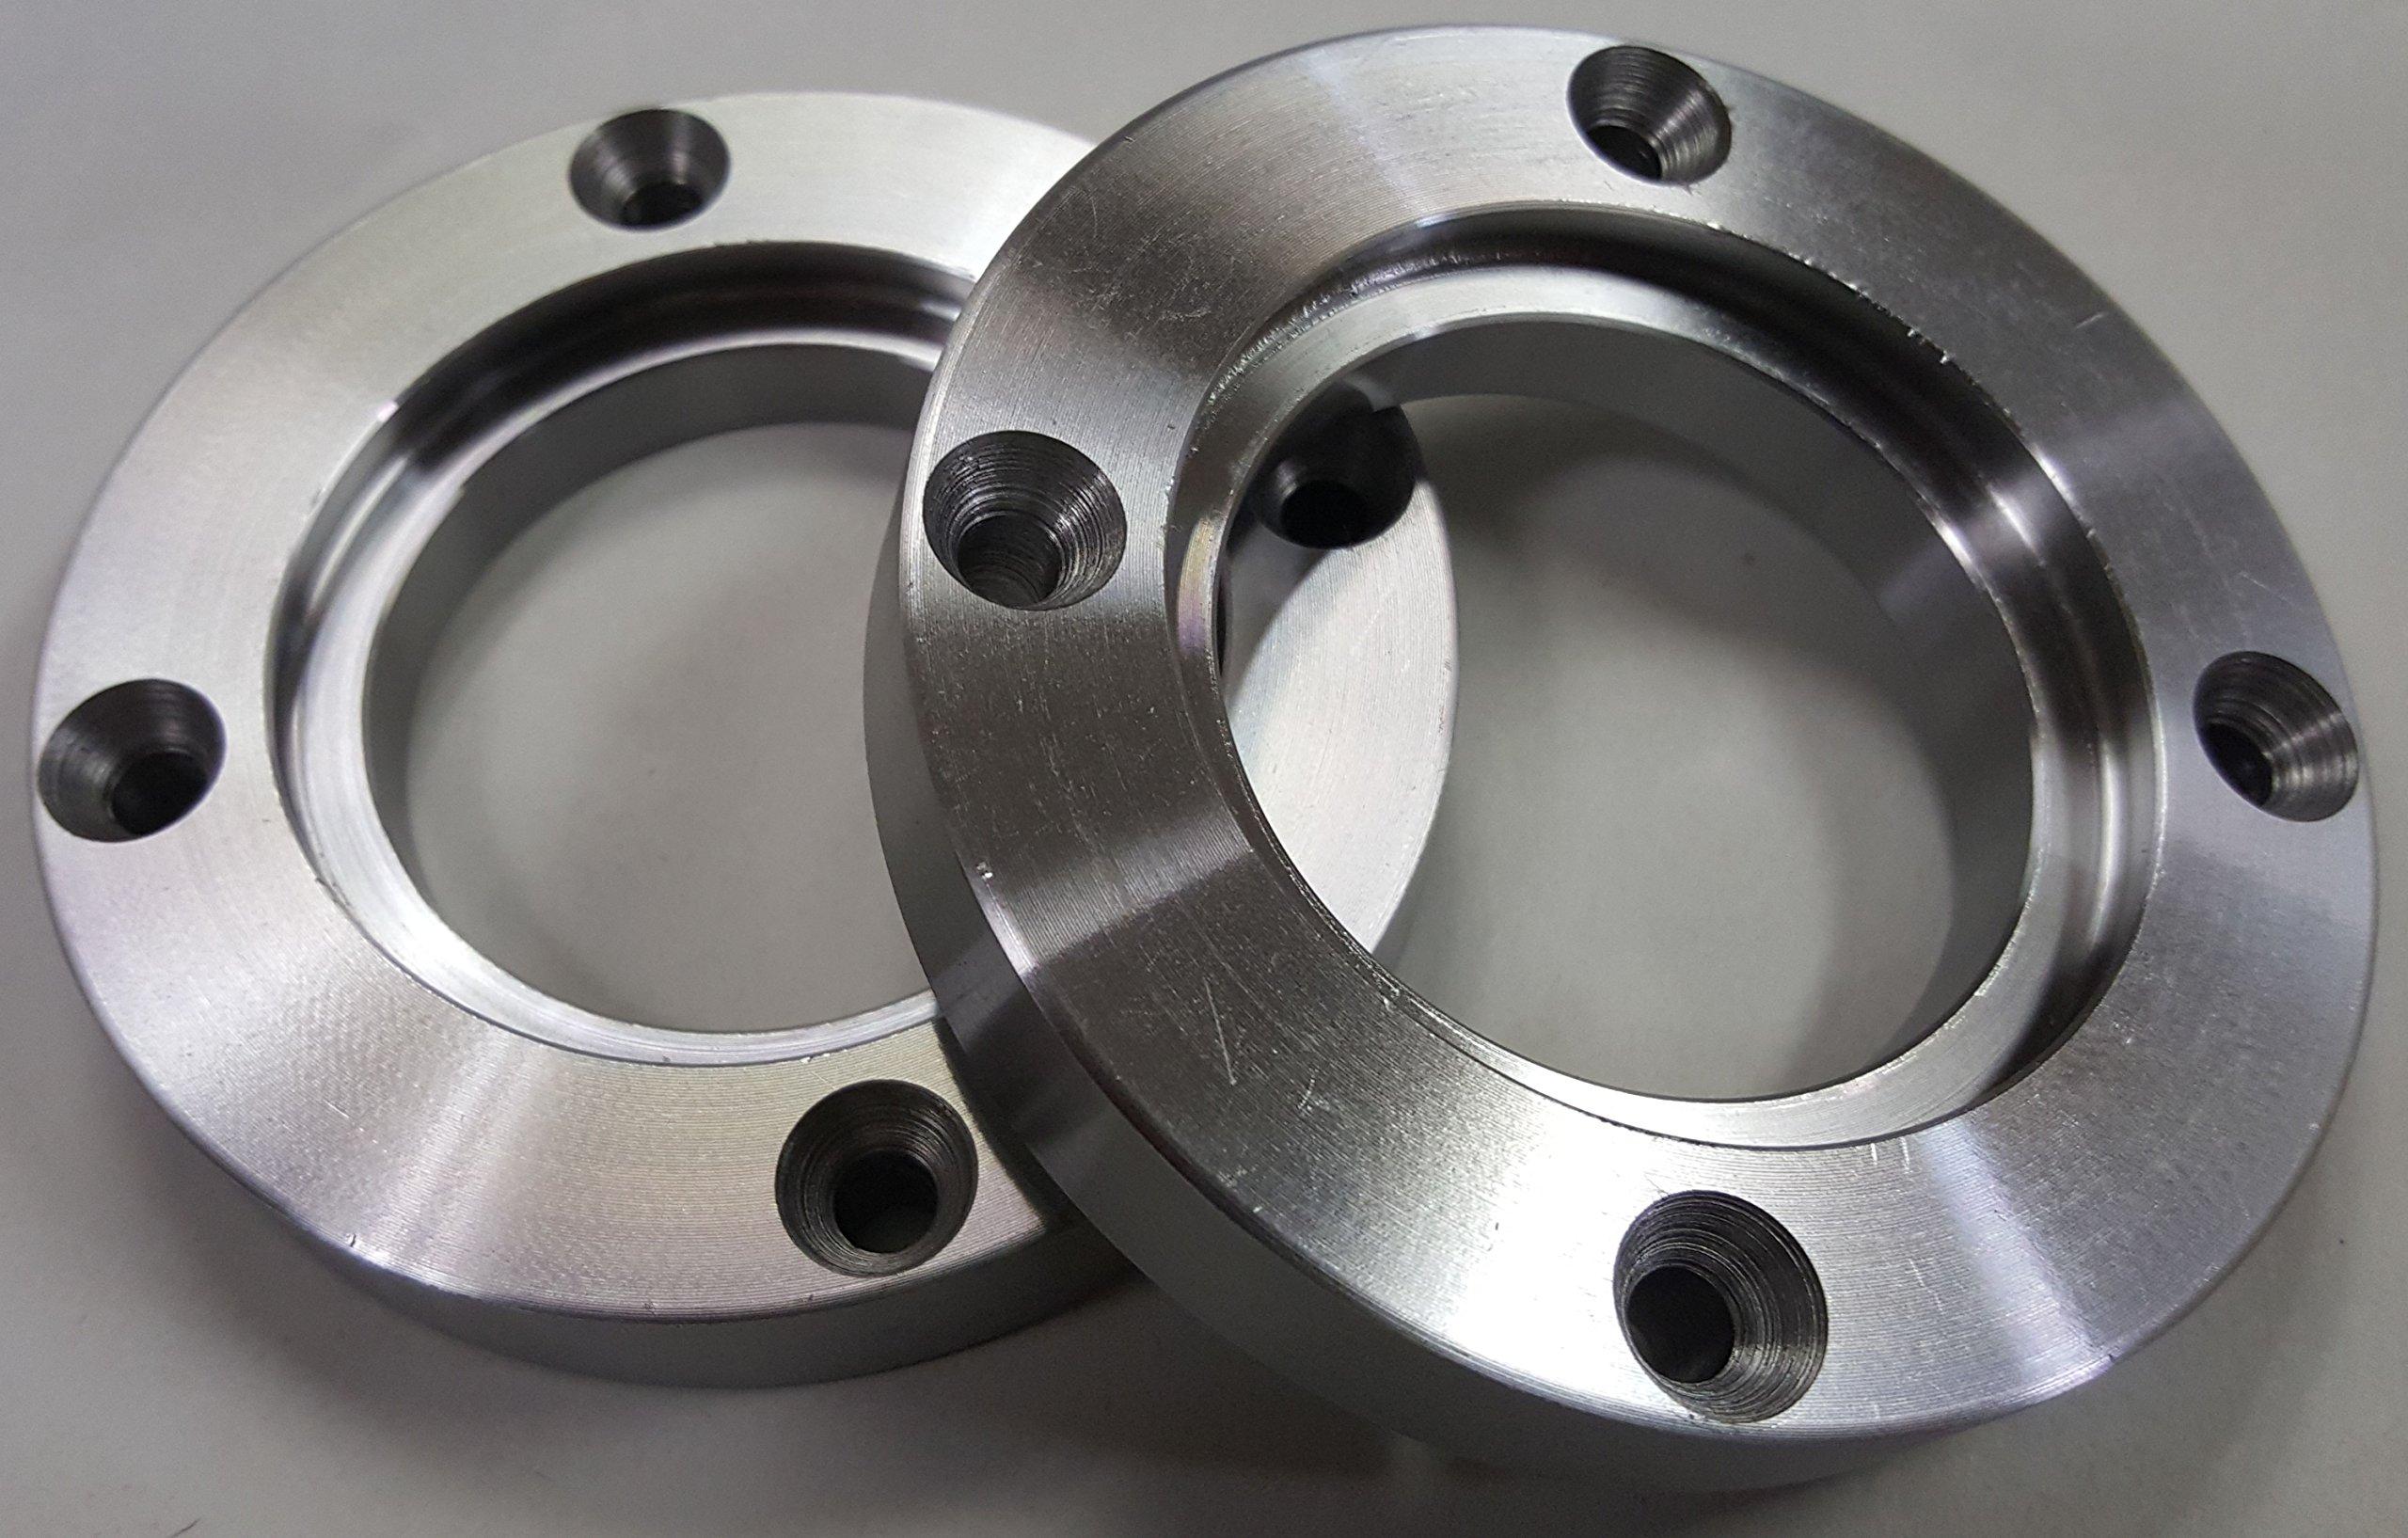 Set of 2 X Nova 6000 2'' (50mm) Face Plate ring- 3'' Diameter, fits Nova 2'' Jaw Sets by Nova